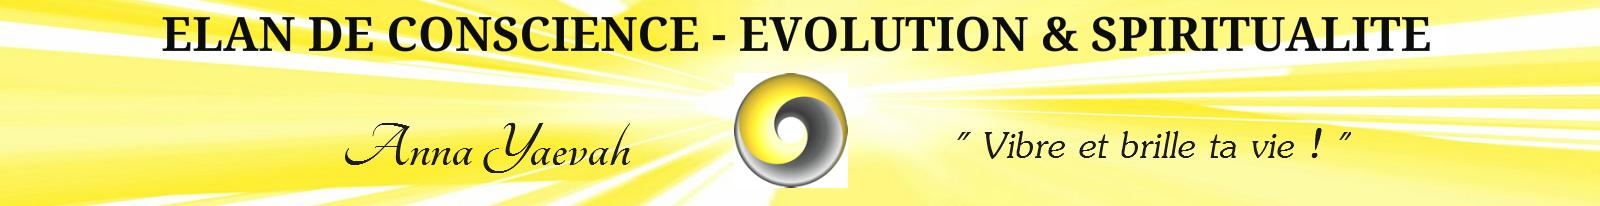 Elan de Conscience - Evolution & Spiritualité